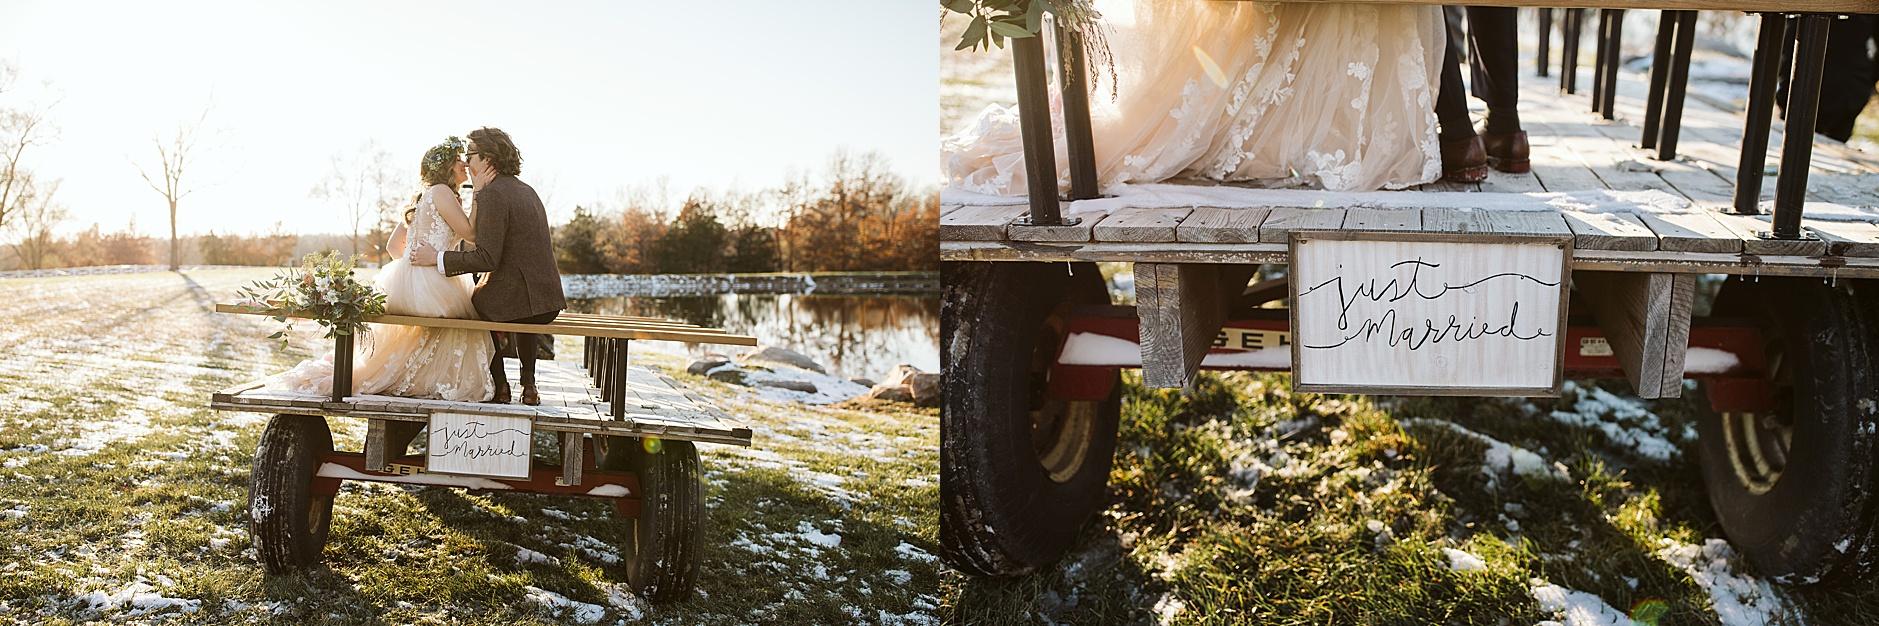 kansas city wedding venue inspiration-0053.jpg